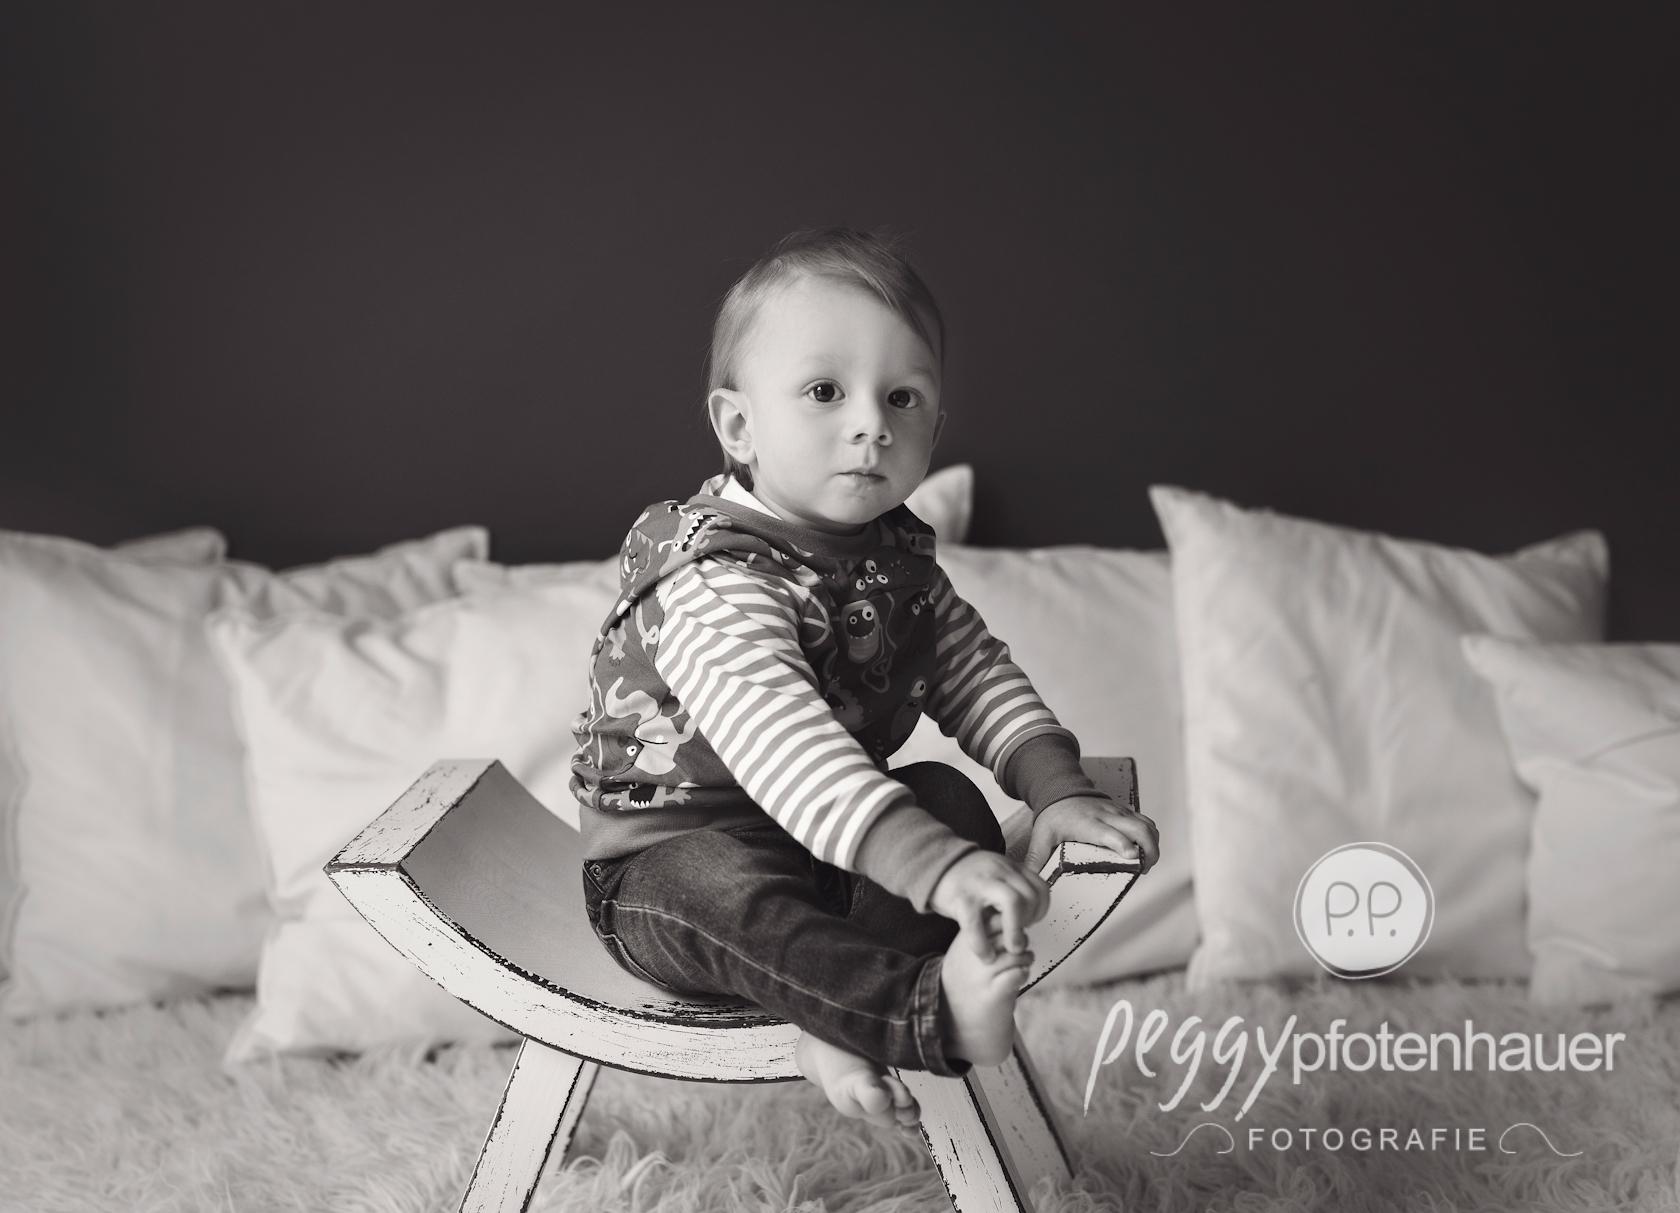 Babyfotograf Erlangen - Fotografin Peggy Pfotenhauer